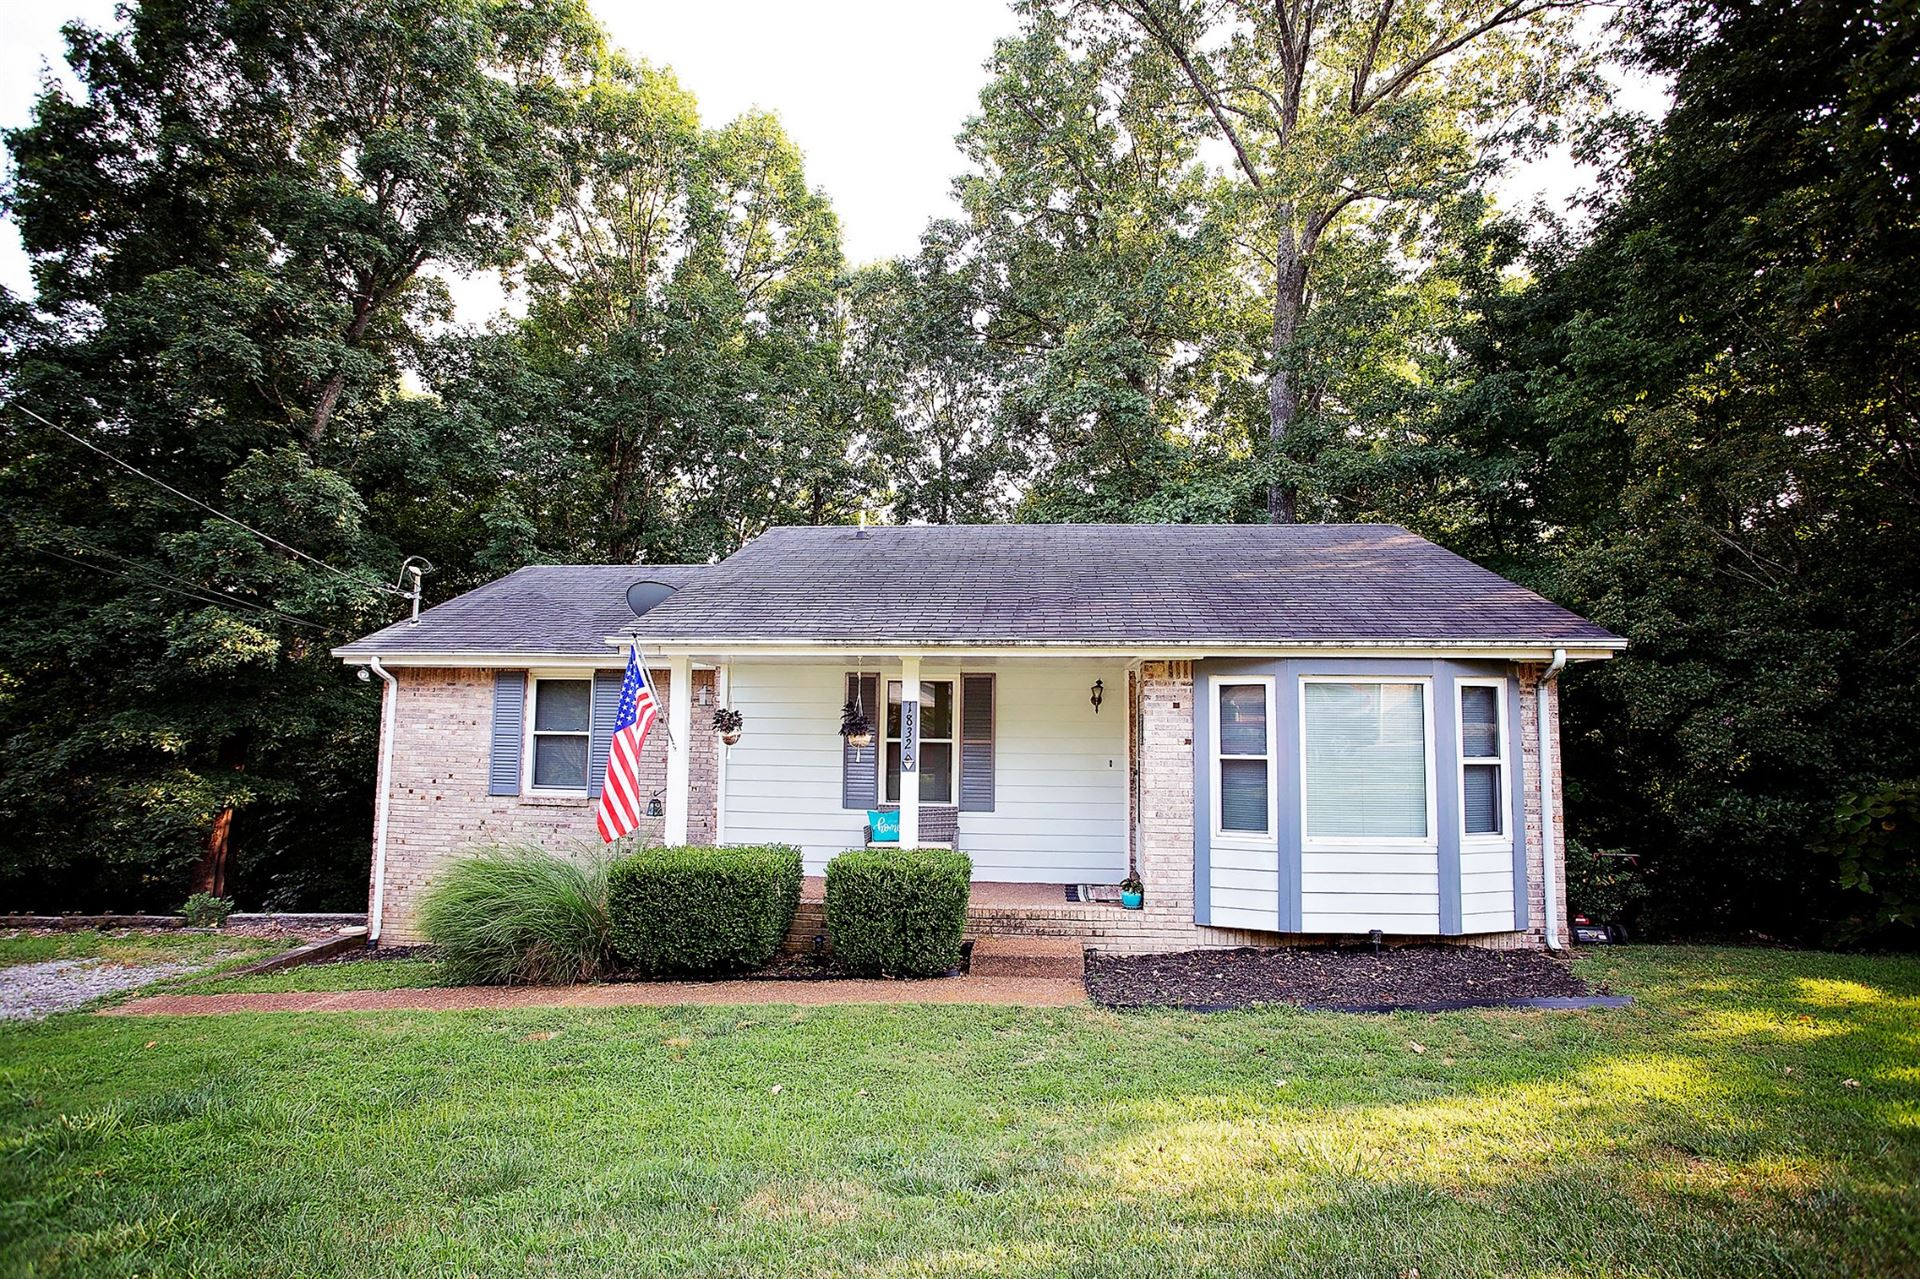 1832 Winding Way Dr, White House, TN 37188 - MLS#: 2278409